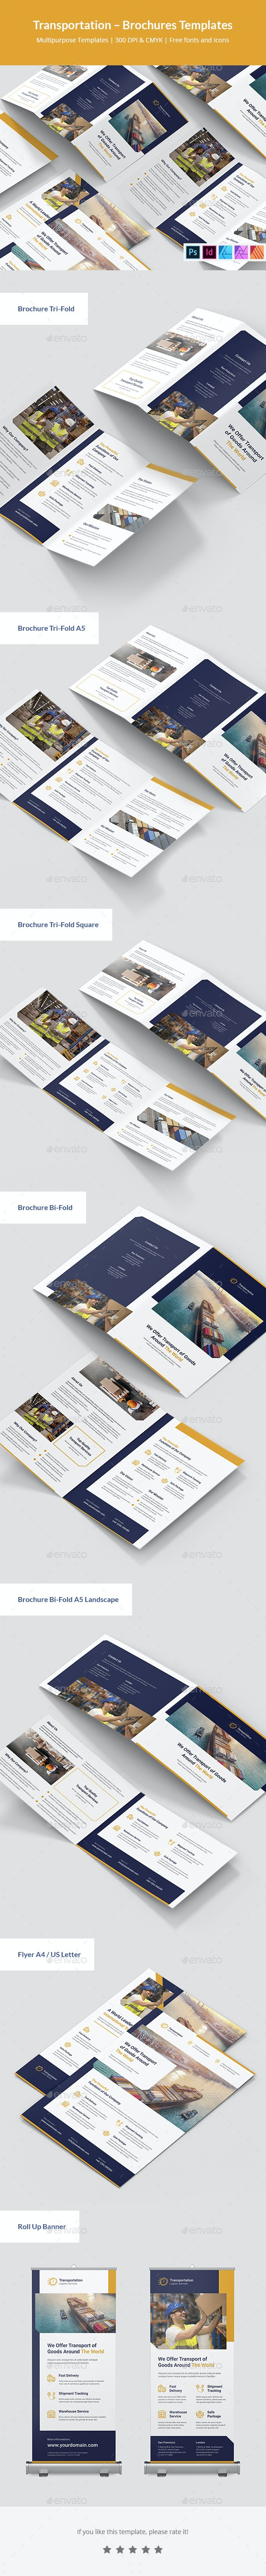 Transportation Brochures Print Templates - Corporate Brochures